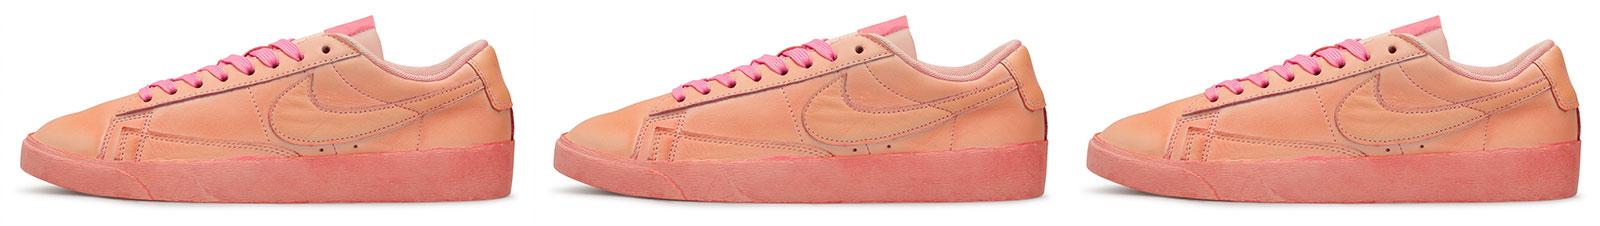 Comme des Garçons Girl x Nike